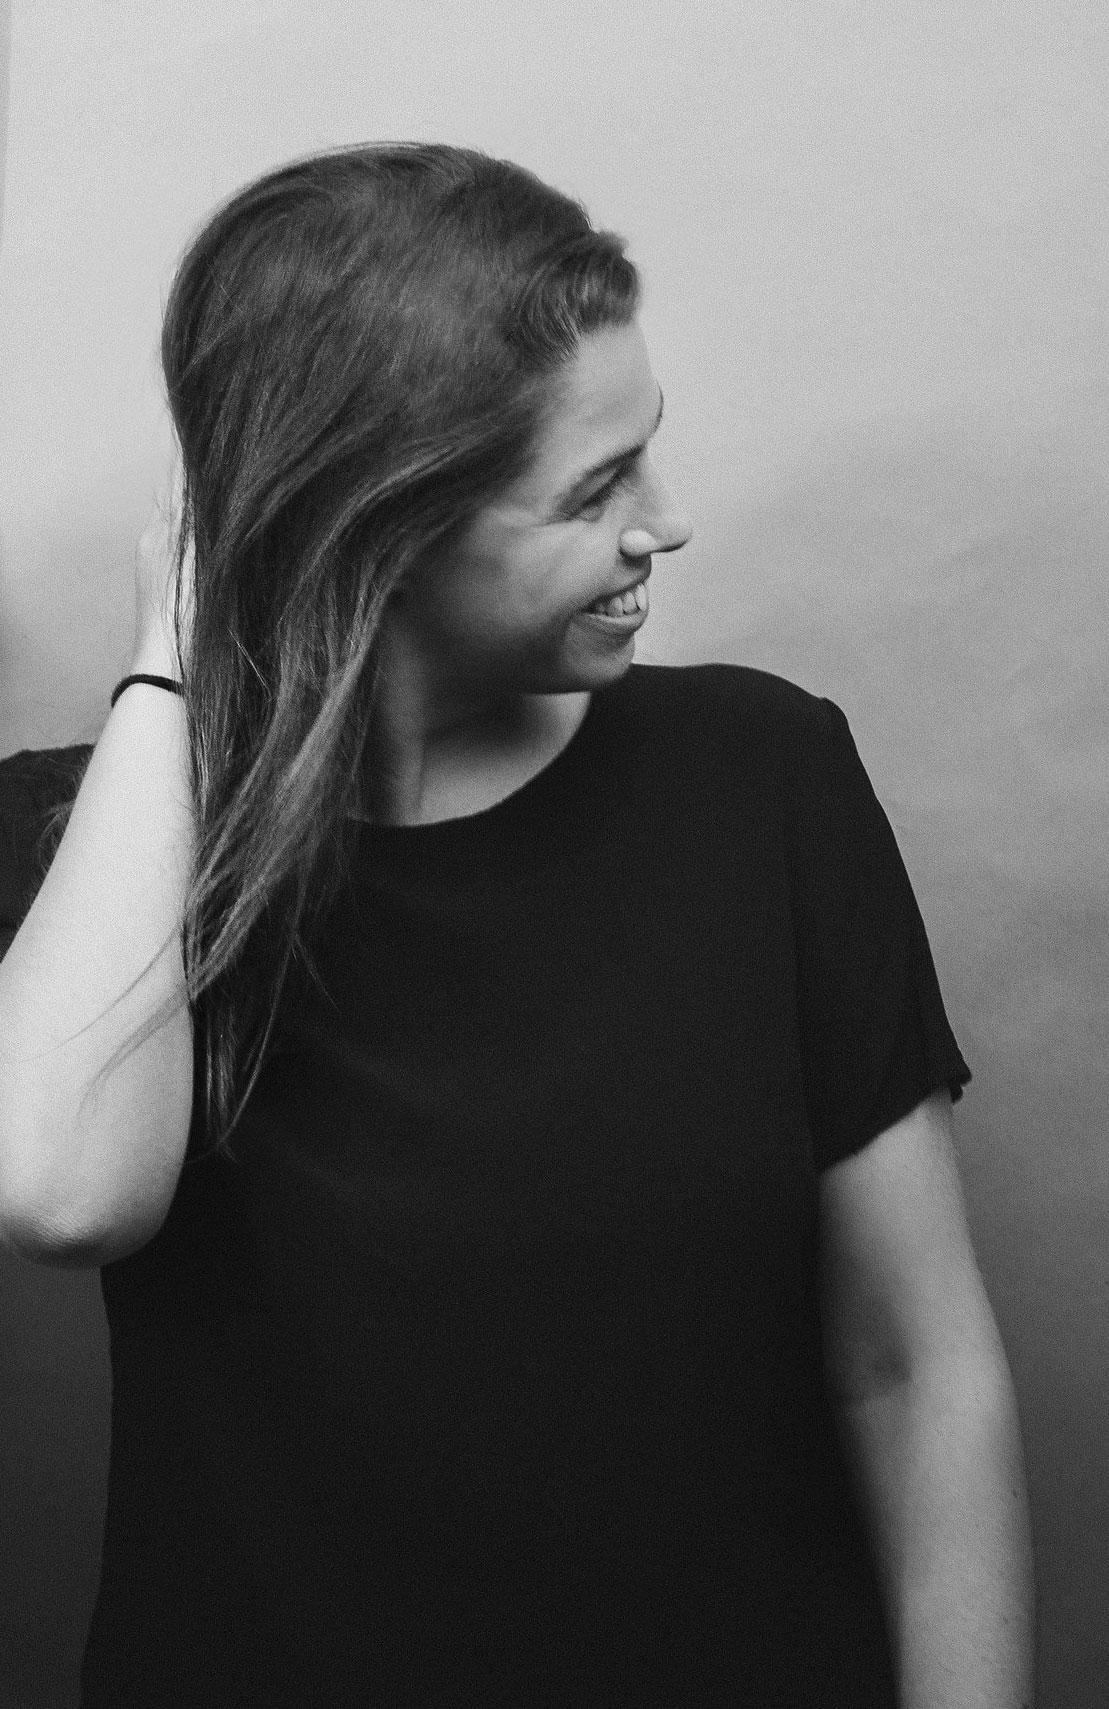 munich-mountain-girls-verena-buerstl-nvc-profil